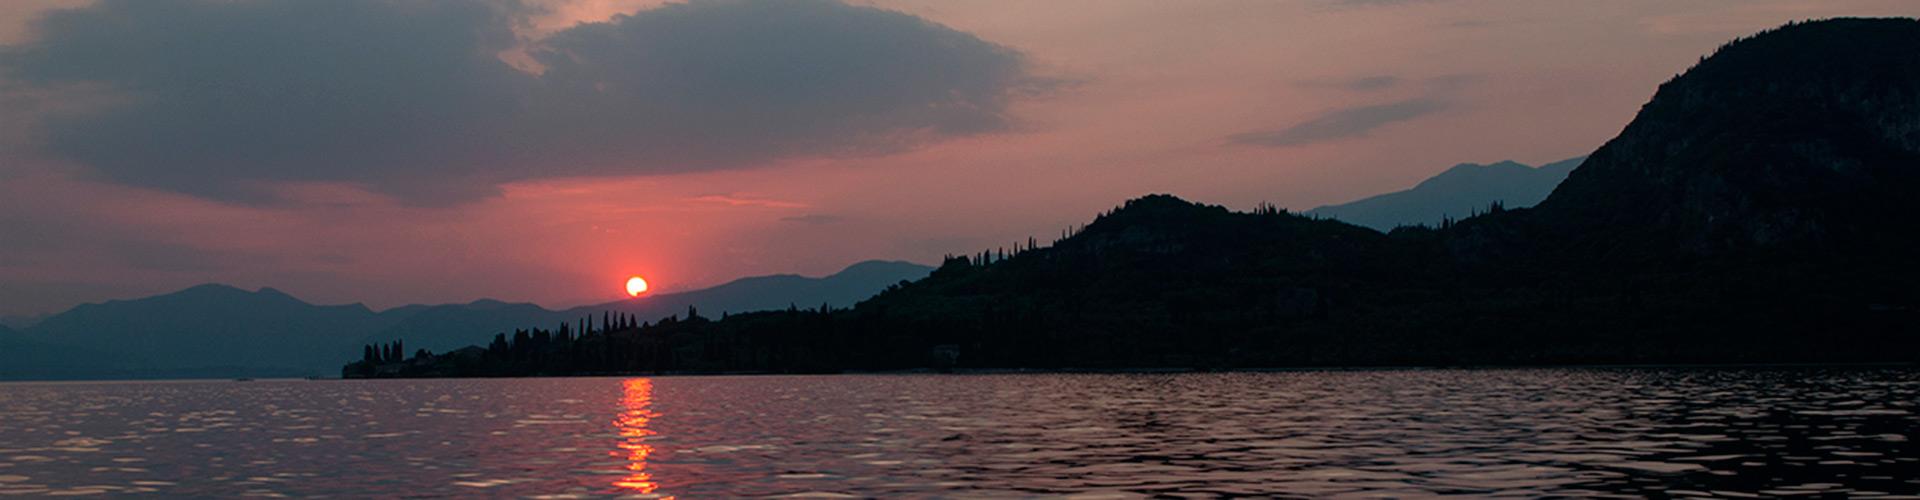 Agriturismo Al Colle - Garda Lake - Verona